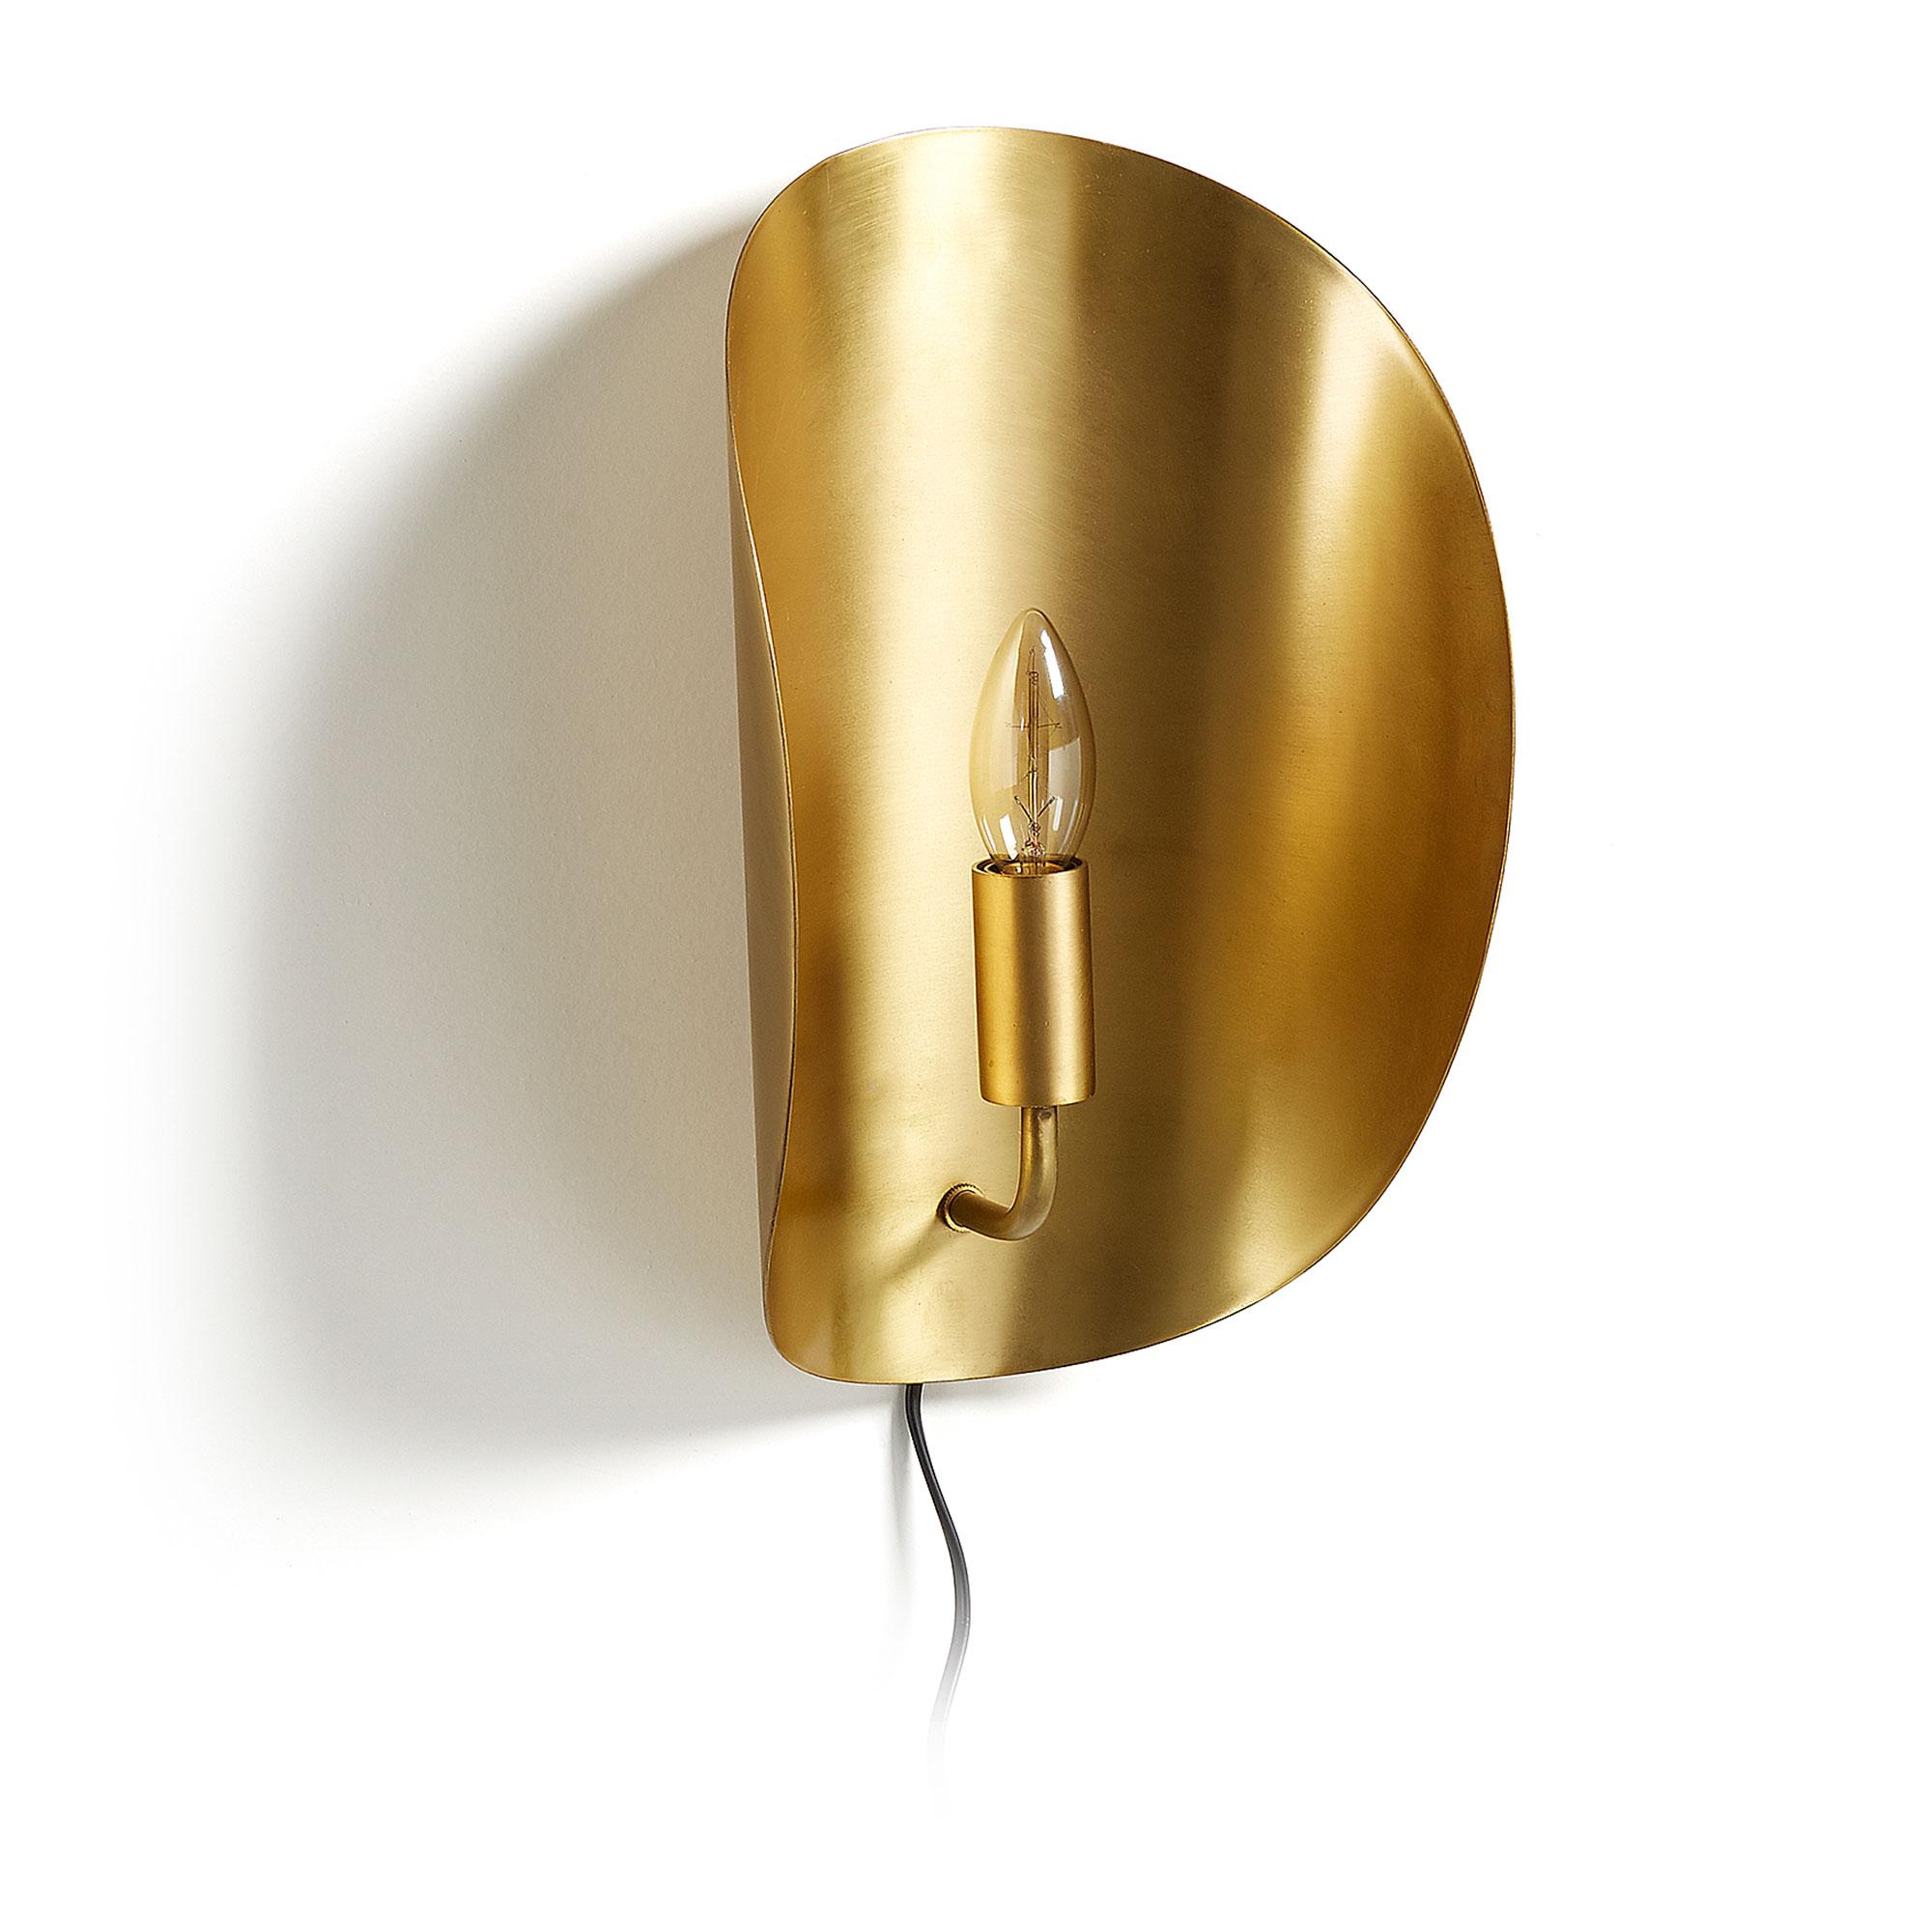 laforma – Laforma calheiro væglampe - messing metal på boboonline.dk